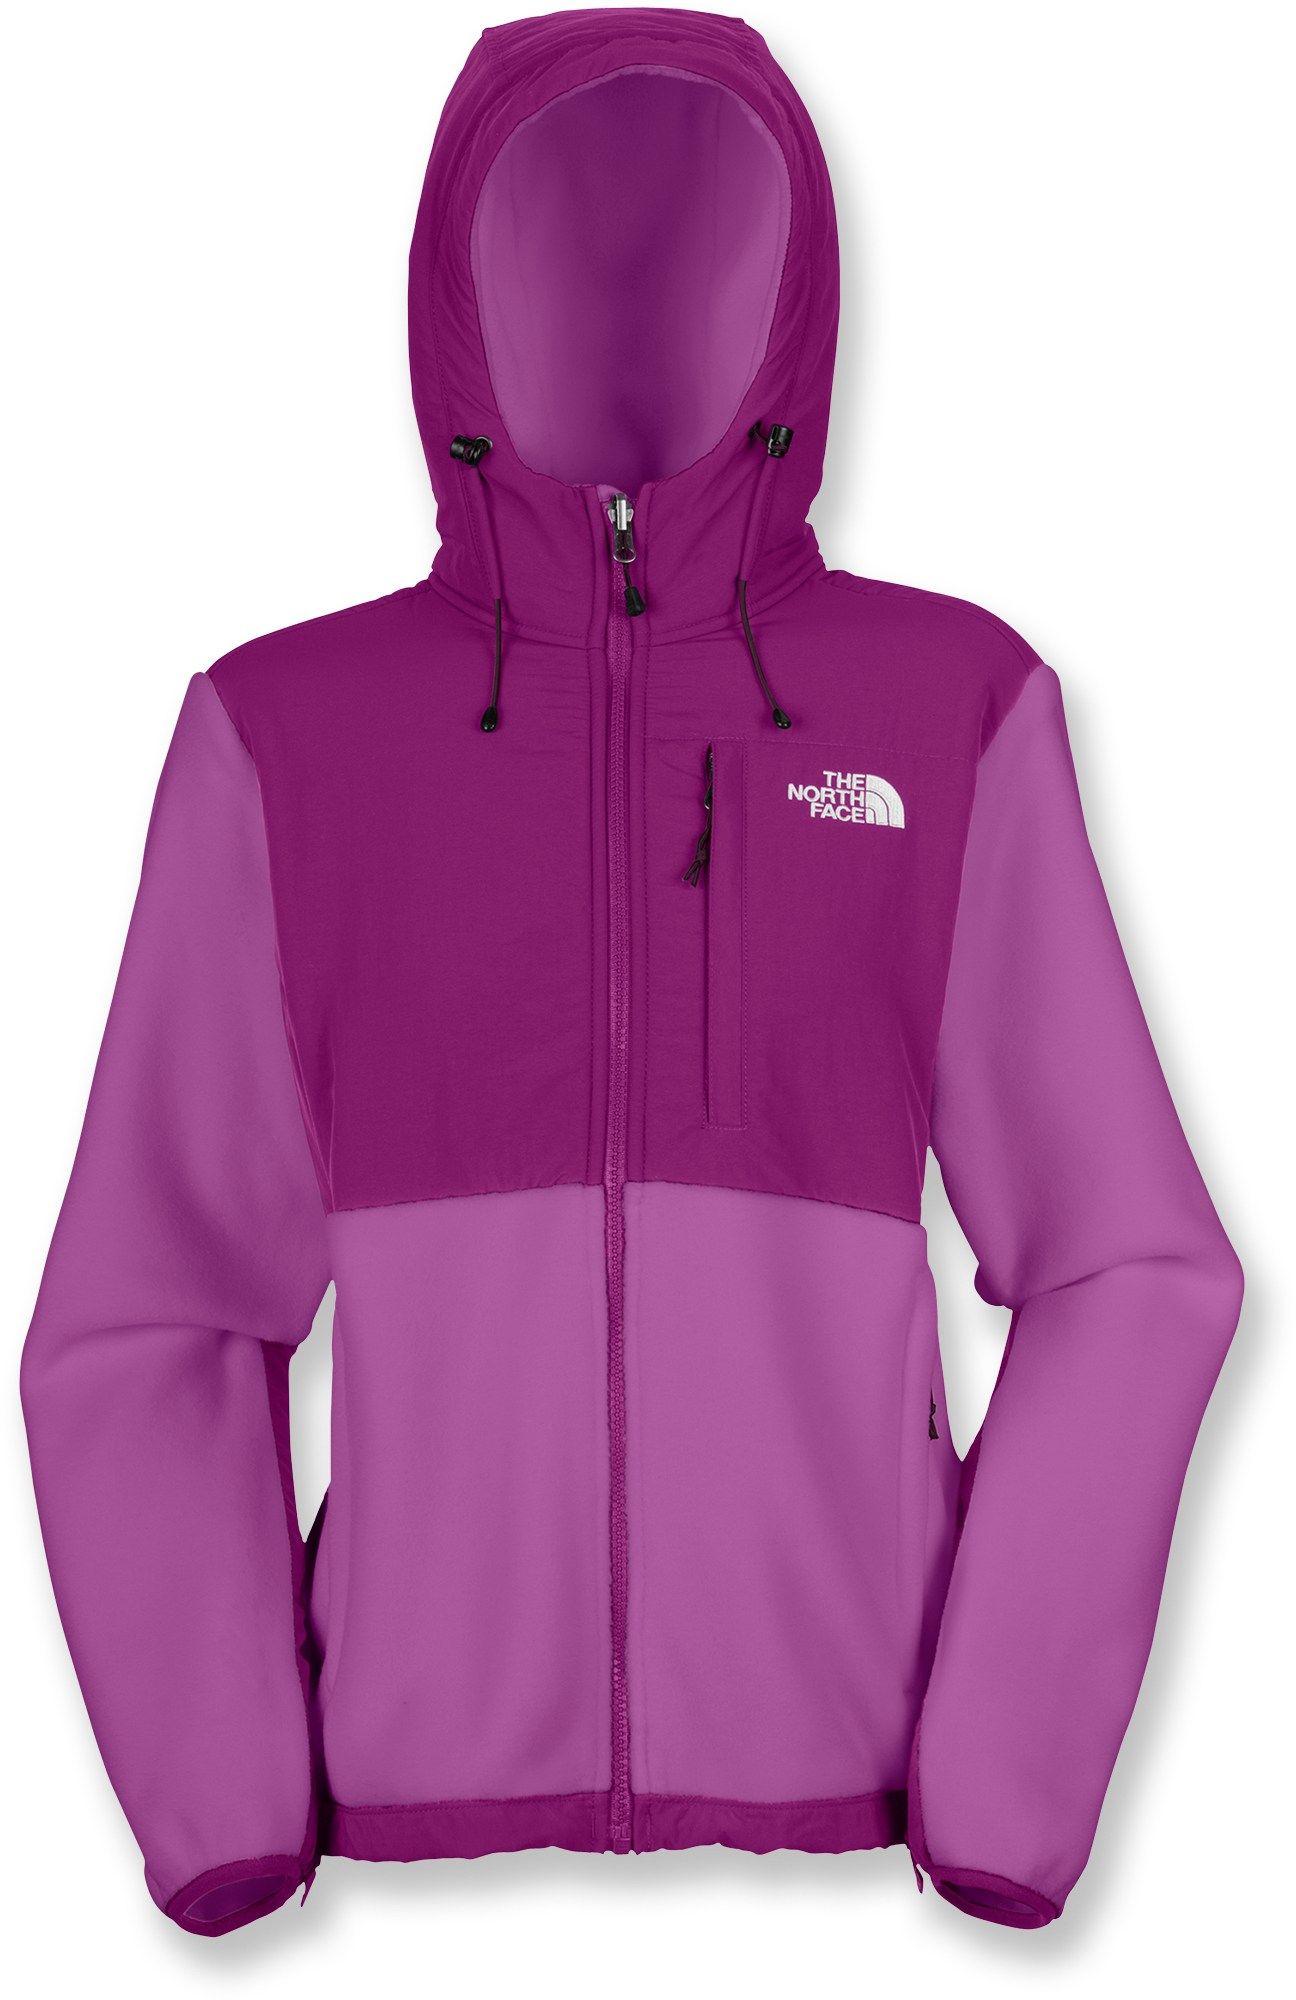 d865cc4b07f3 The North Face Denali Hoodie Fleece Jacket - Women s - Free Shipping at  REI.com